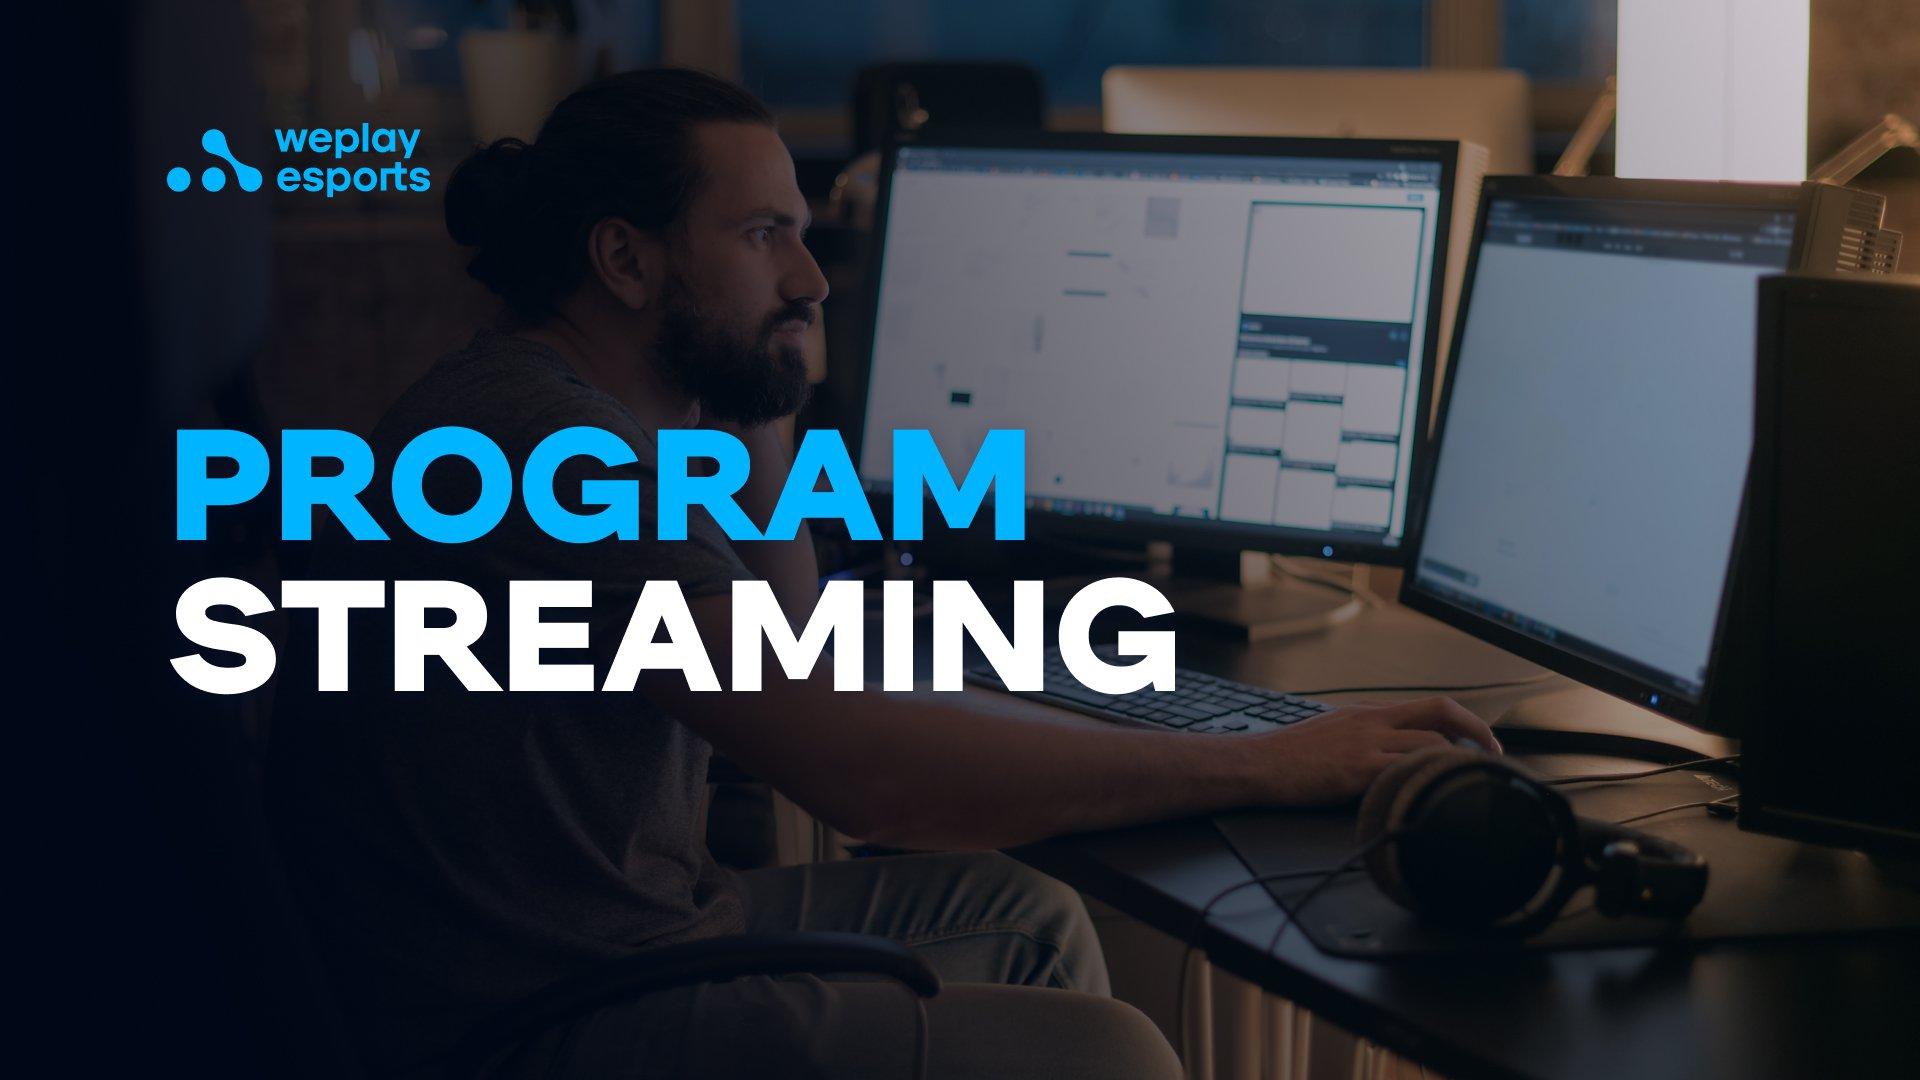 Program Streaming